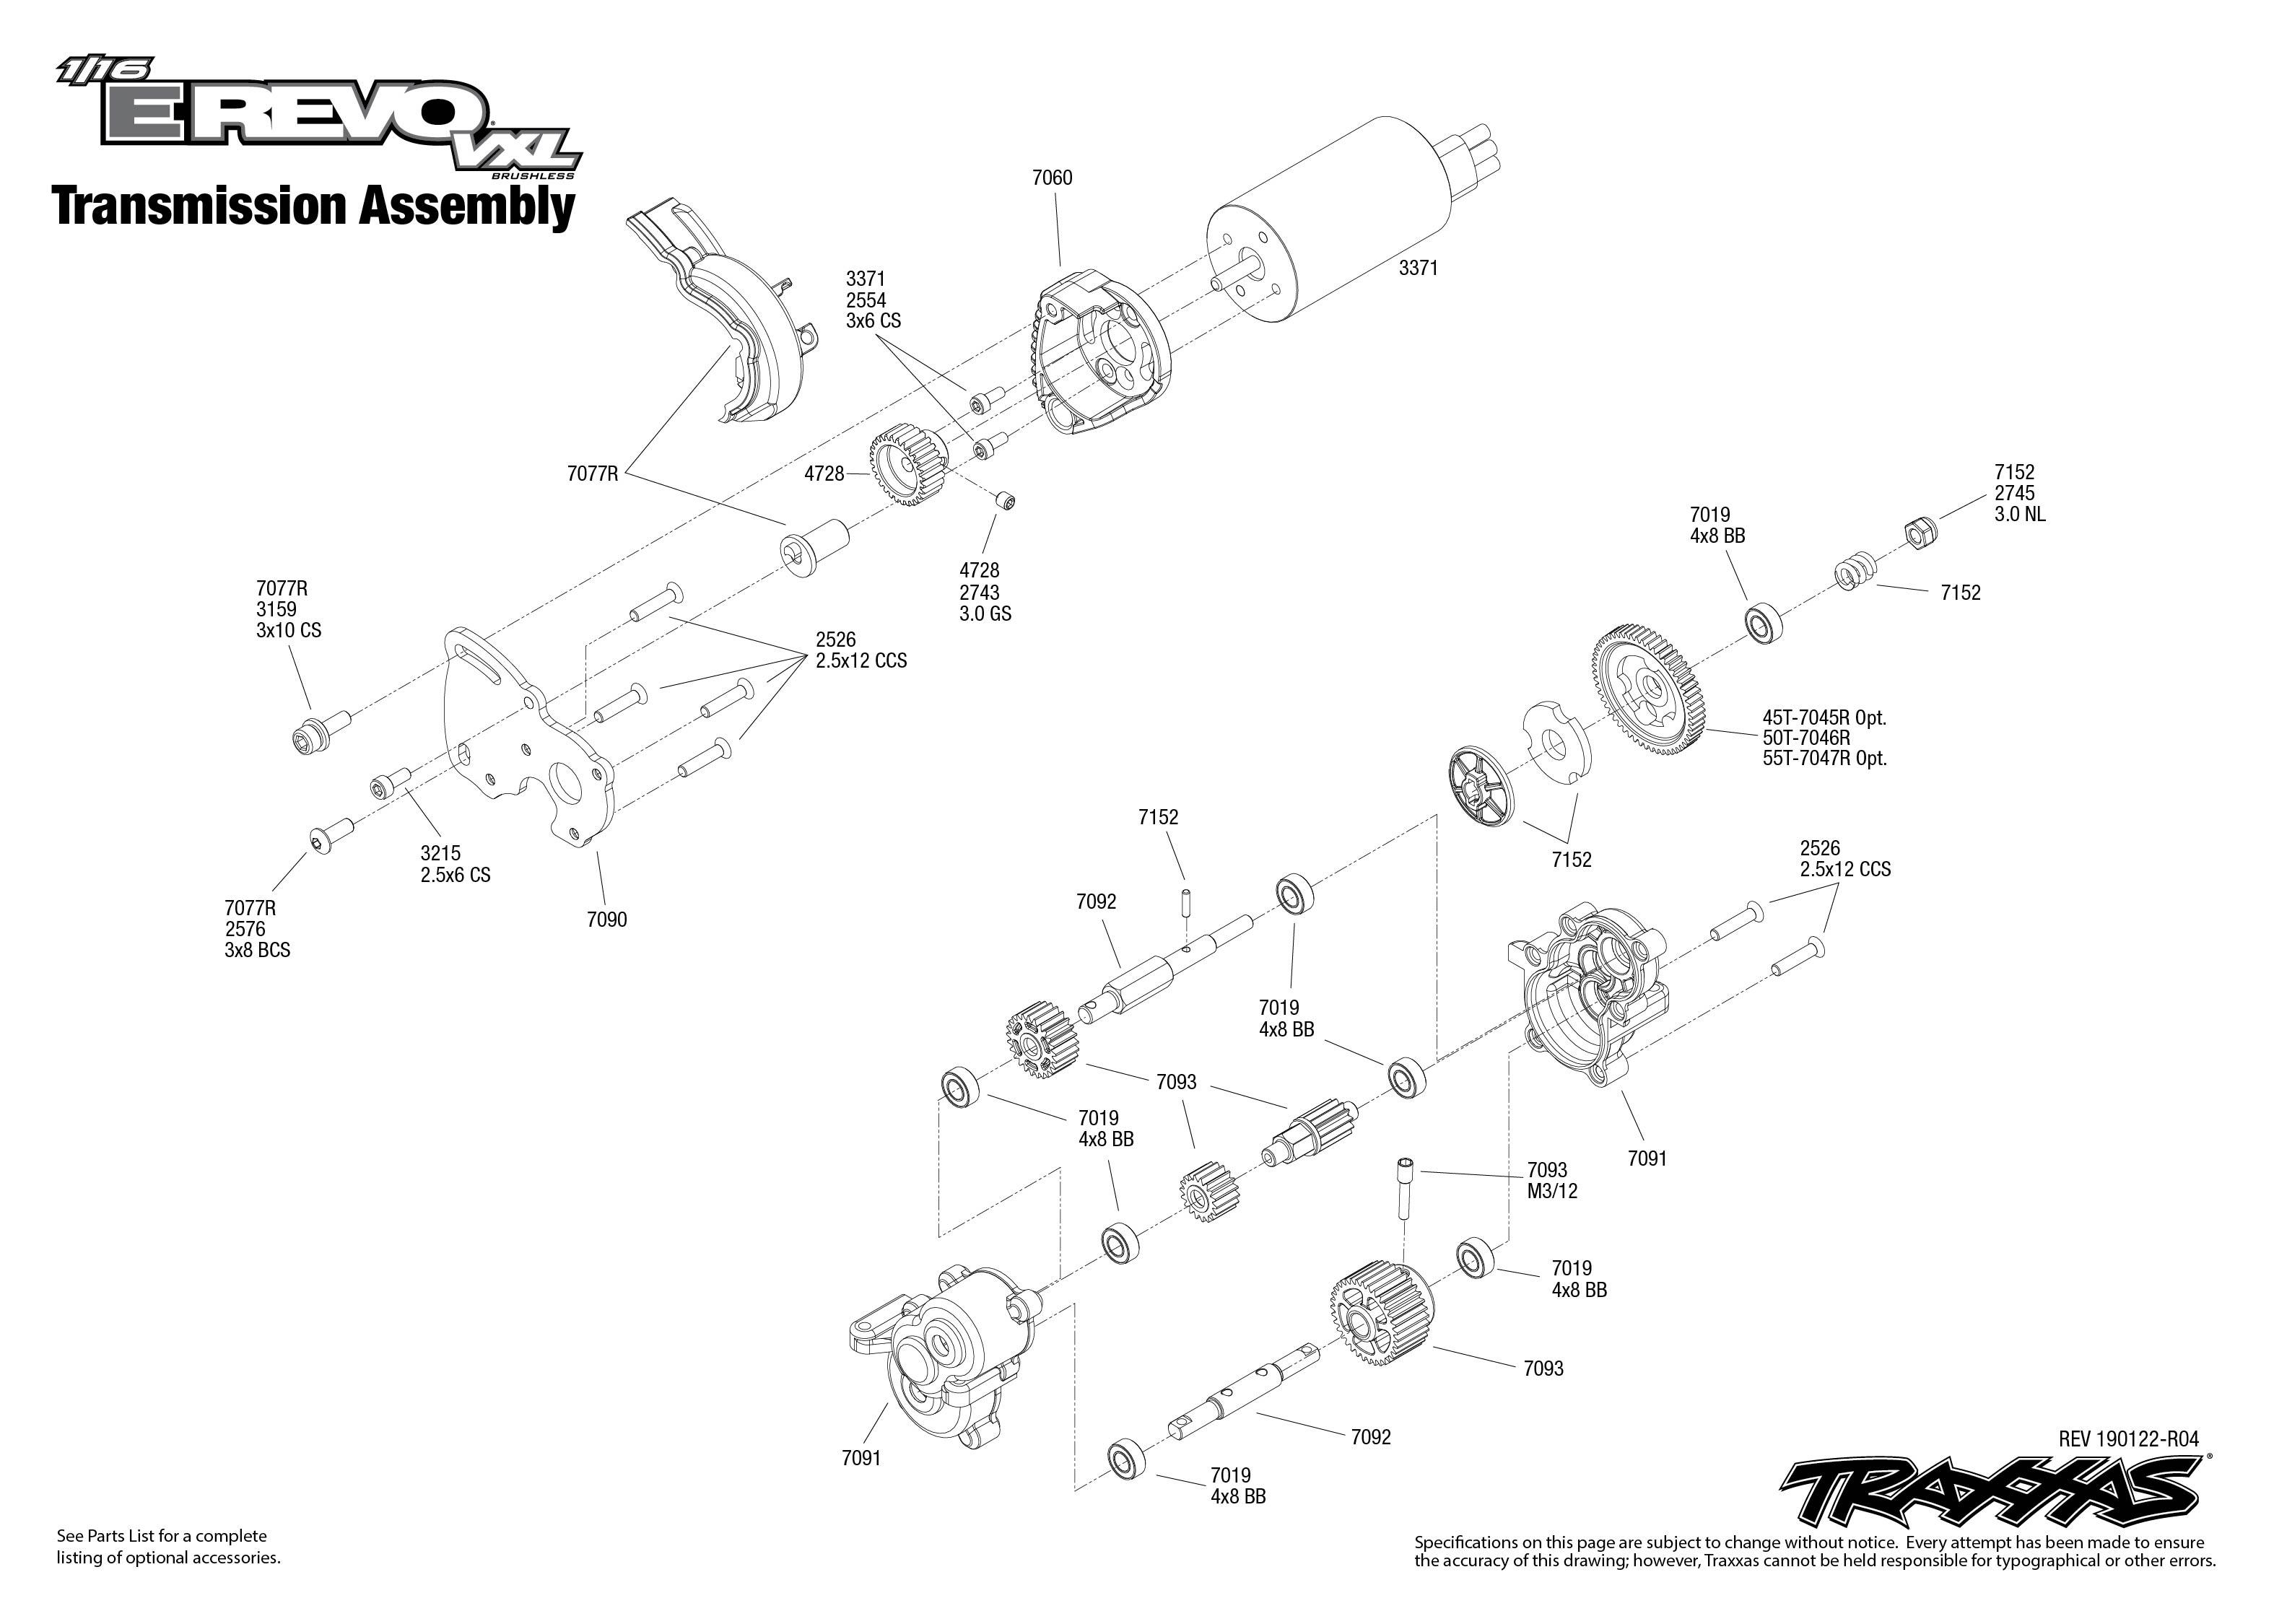 1 16 E Revo Vxl 3 Transmission Assembly Exploded